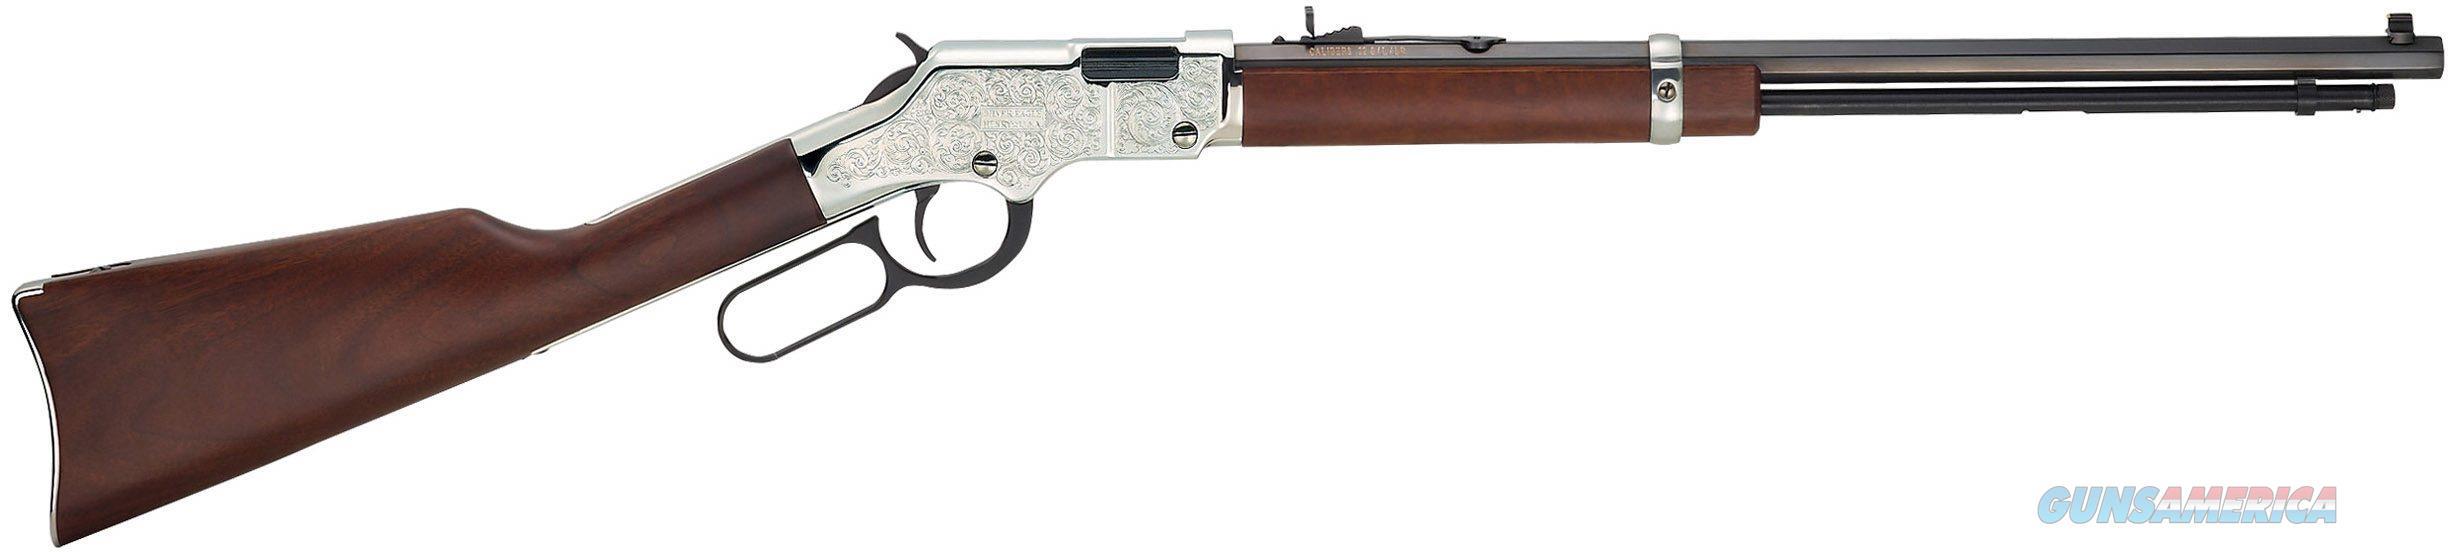 HENRY SILVER EAGLE ENGRAVED .22 S/L/LR H004SE  Guns > Rifles > Henry Rifle Company